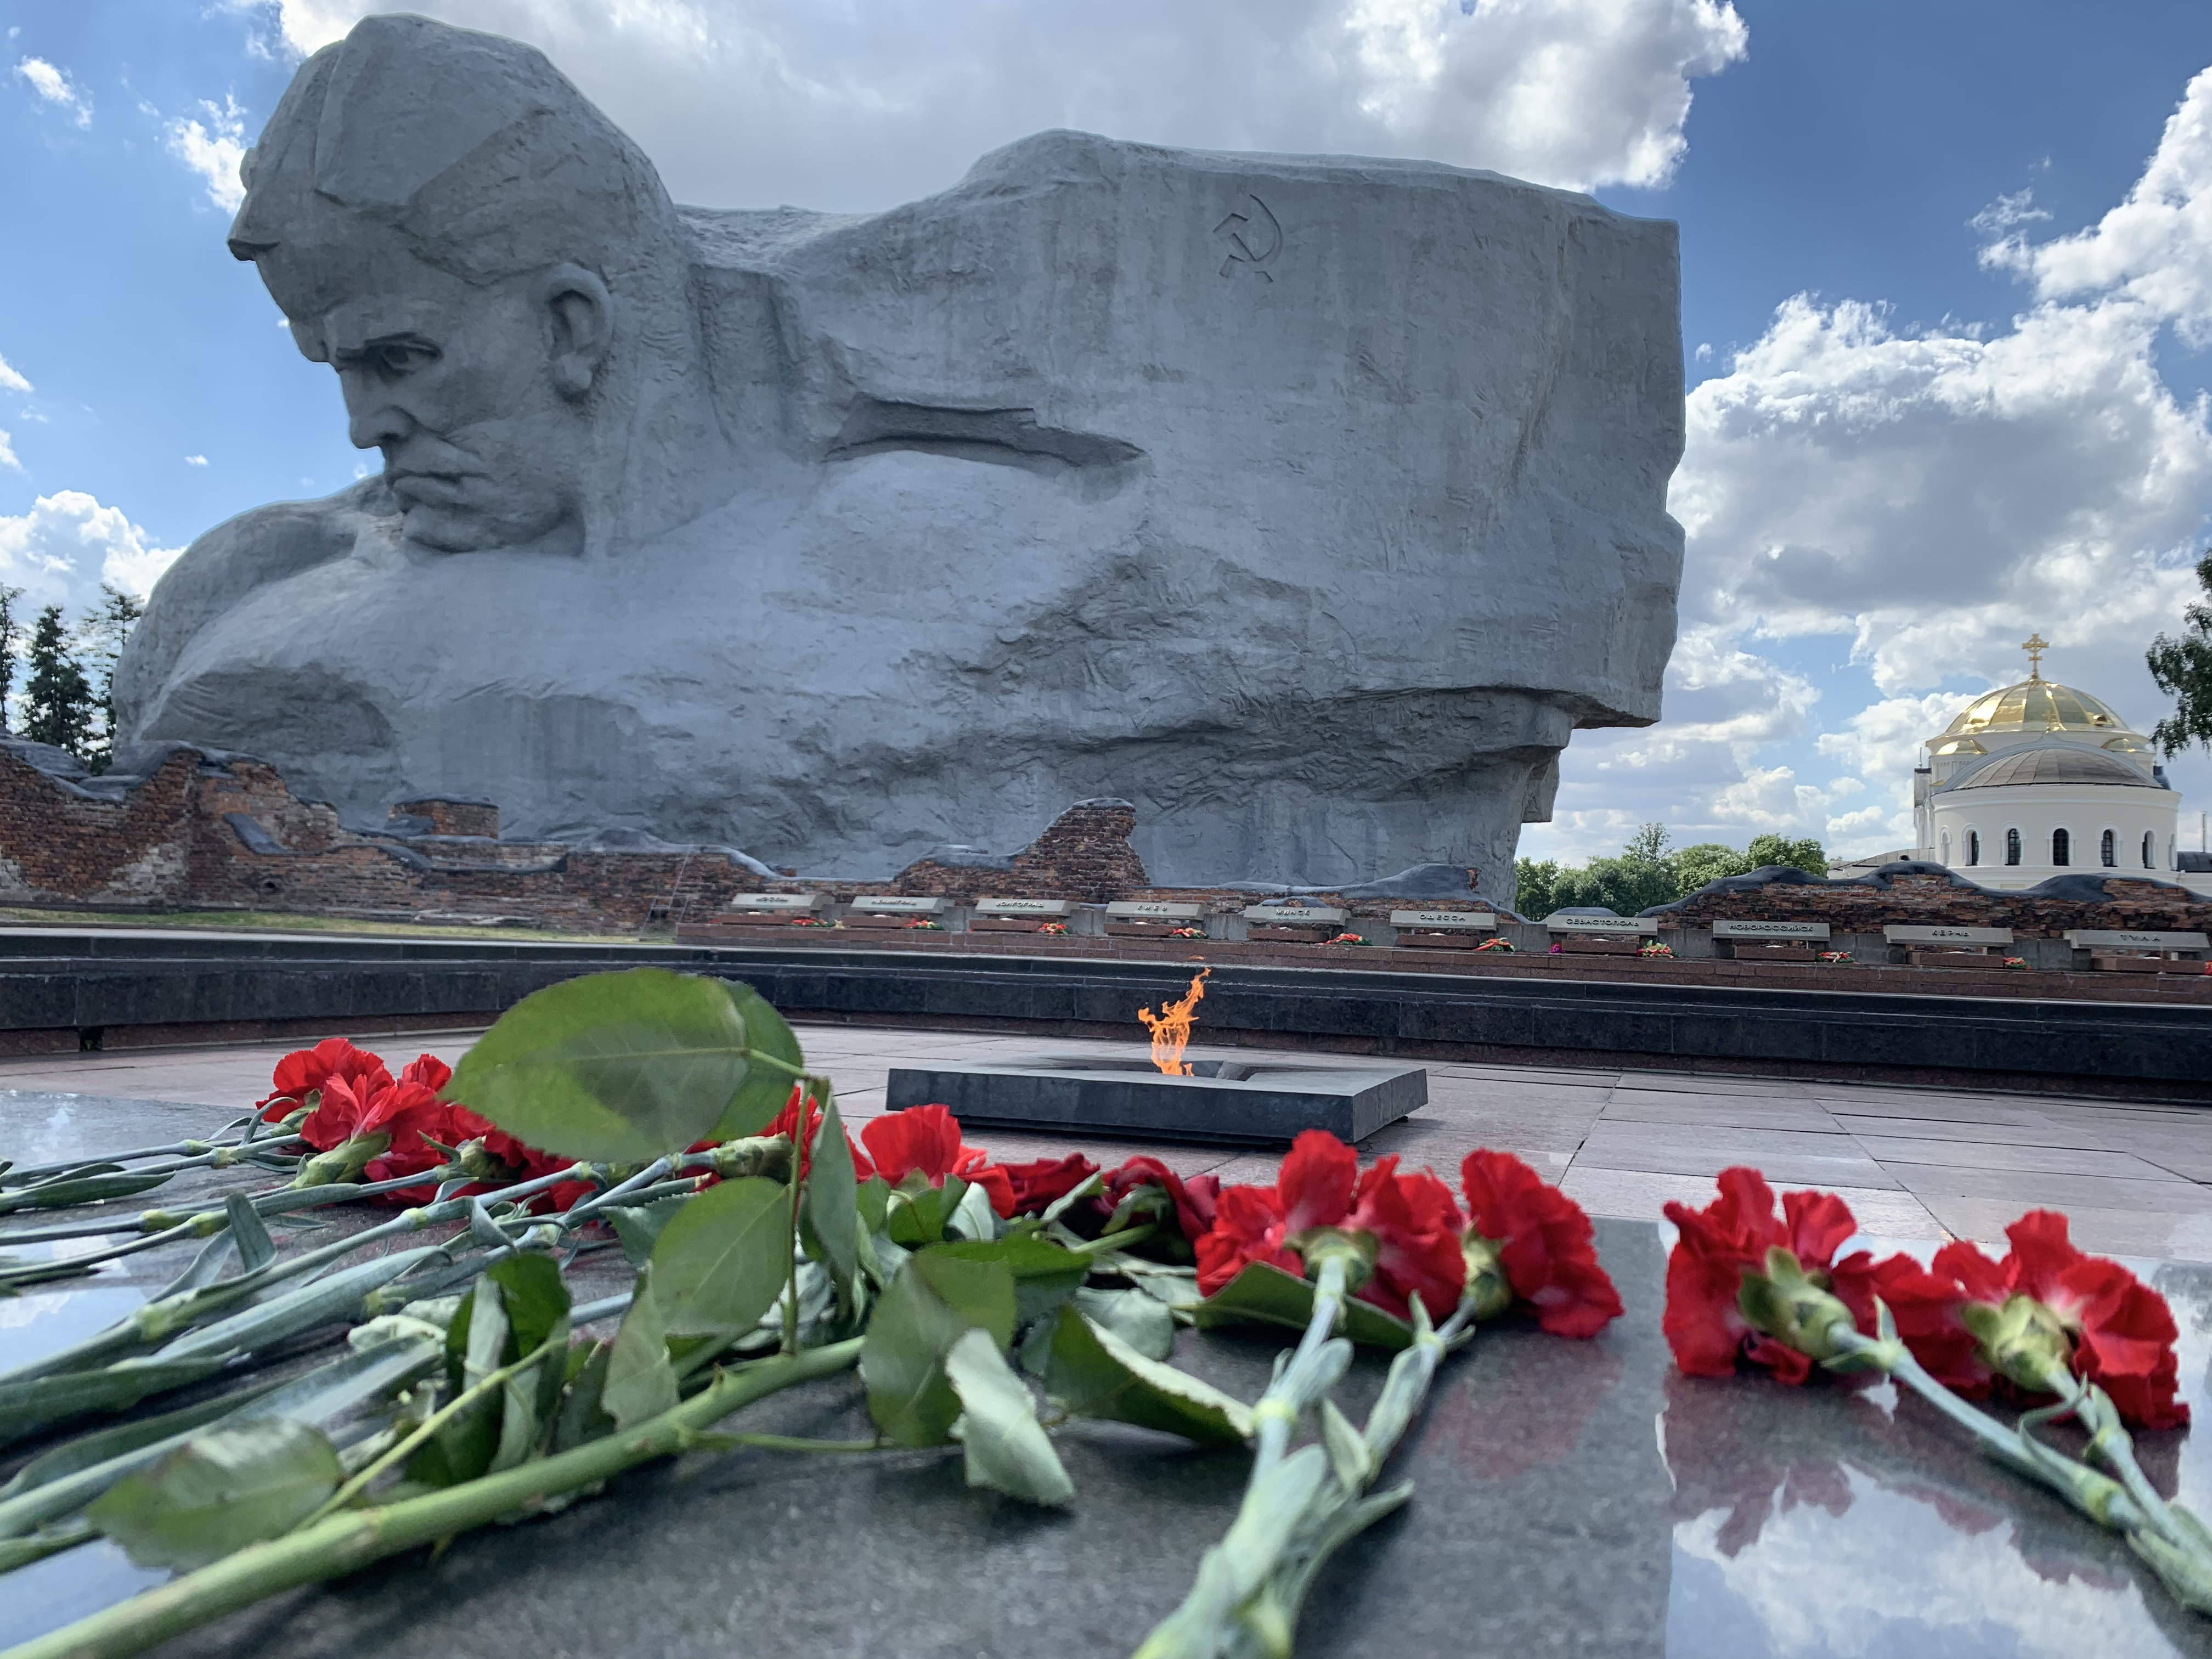 https://upload.wikimedia.org/wikipedia/commons/8/85/Courage_Monument_in_Brest%2C_Belarus.jpg